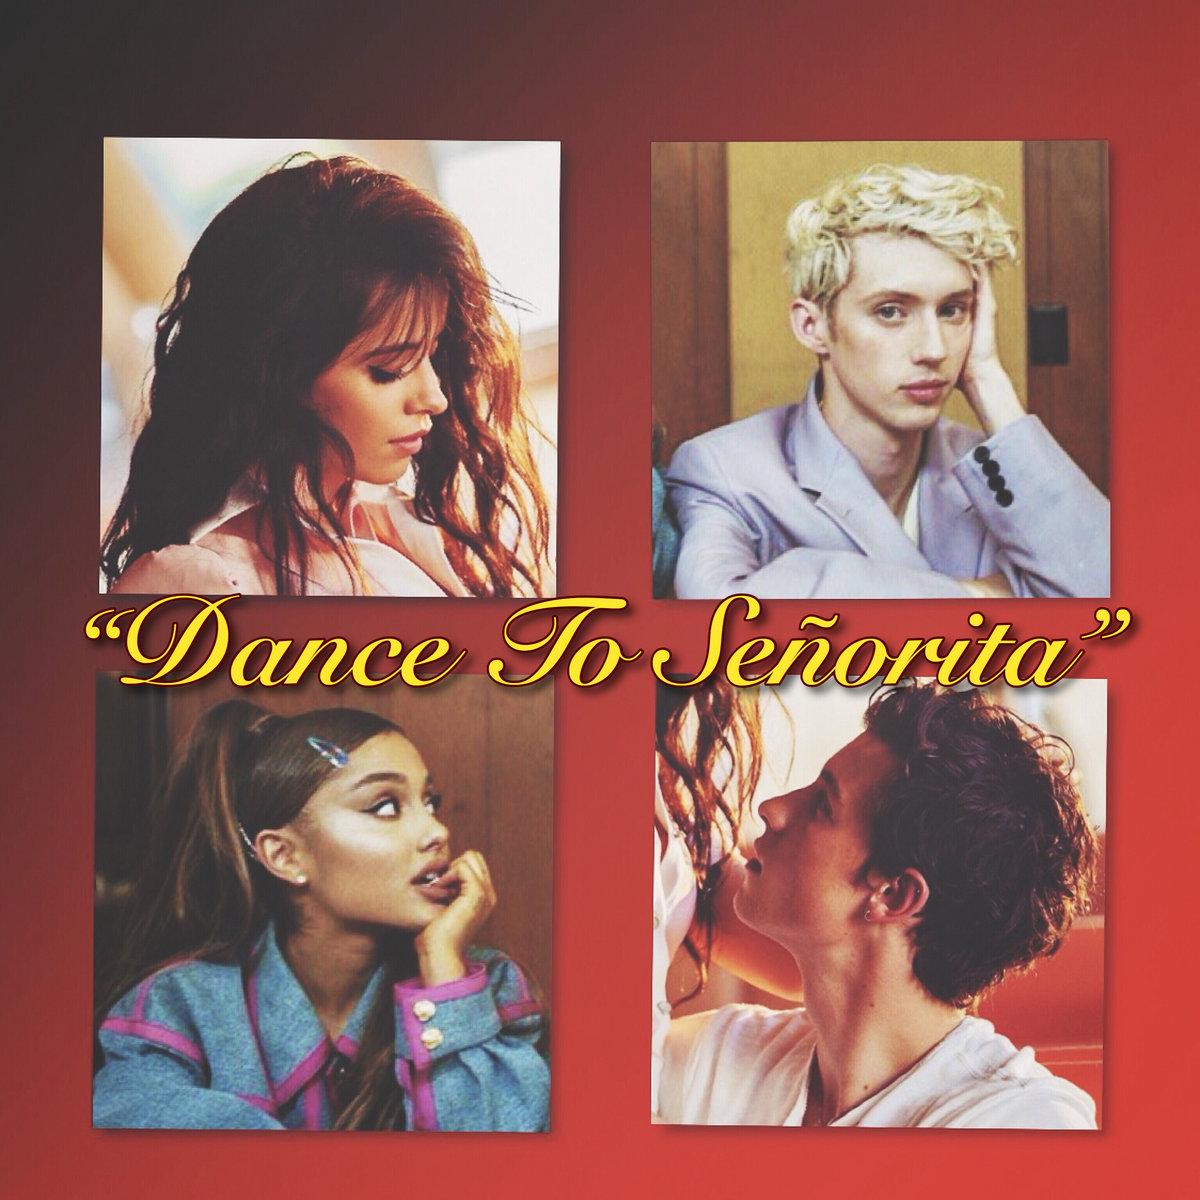 Dance To Senorita Troye Sivan Ariana Grande Shawn Mendes